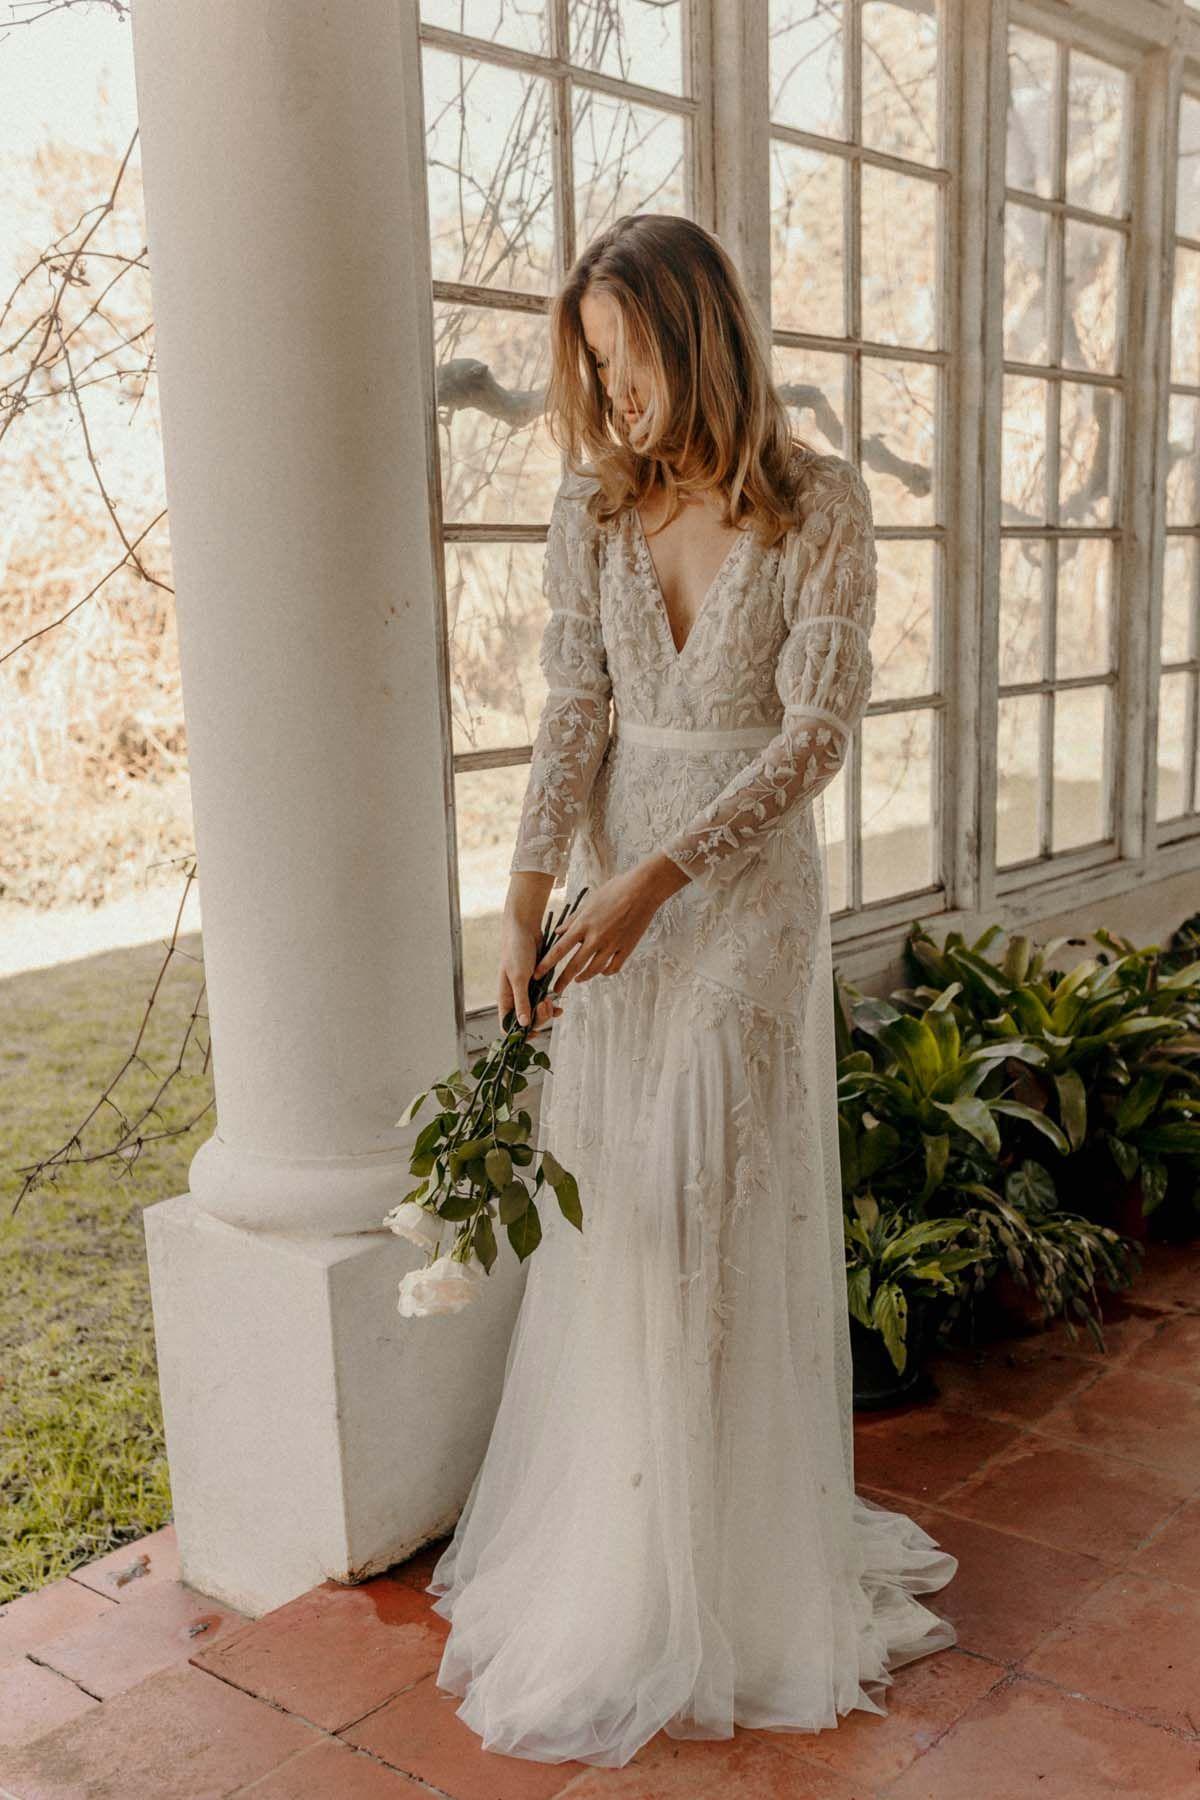 Bo Luca Spring Summer 2020 Wedding Gowns Polka Dot Wedding Wedding Dresses Boho Wedding Dress Polka Dot Wedding Dress [ 1800 x 1200 Pixel ]